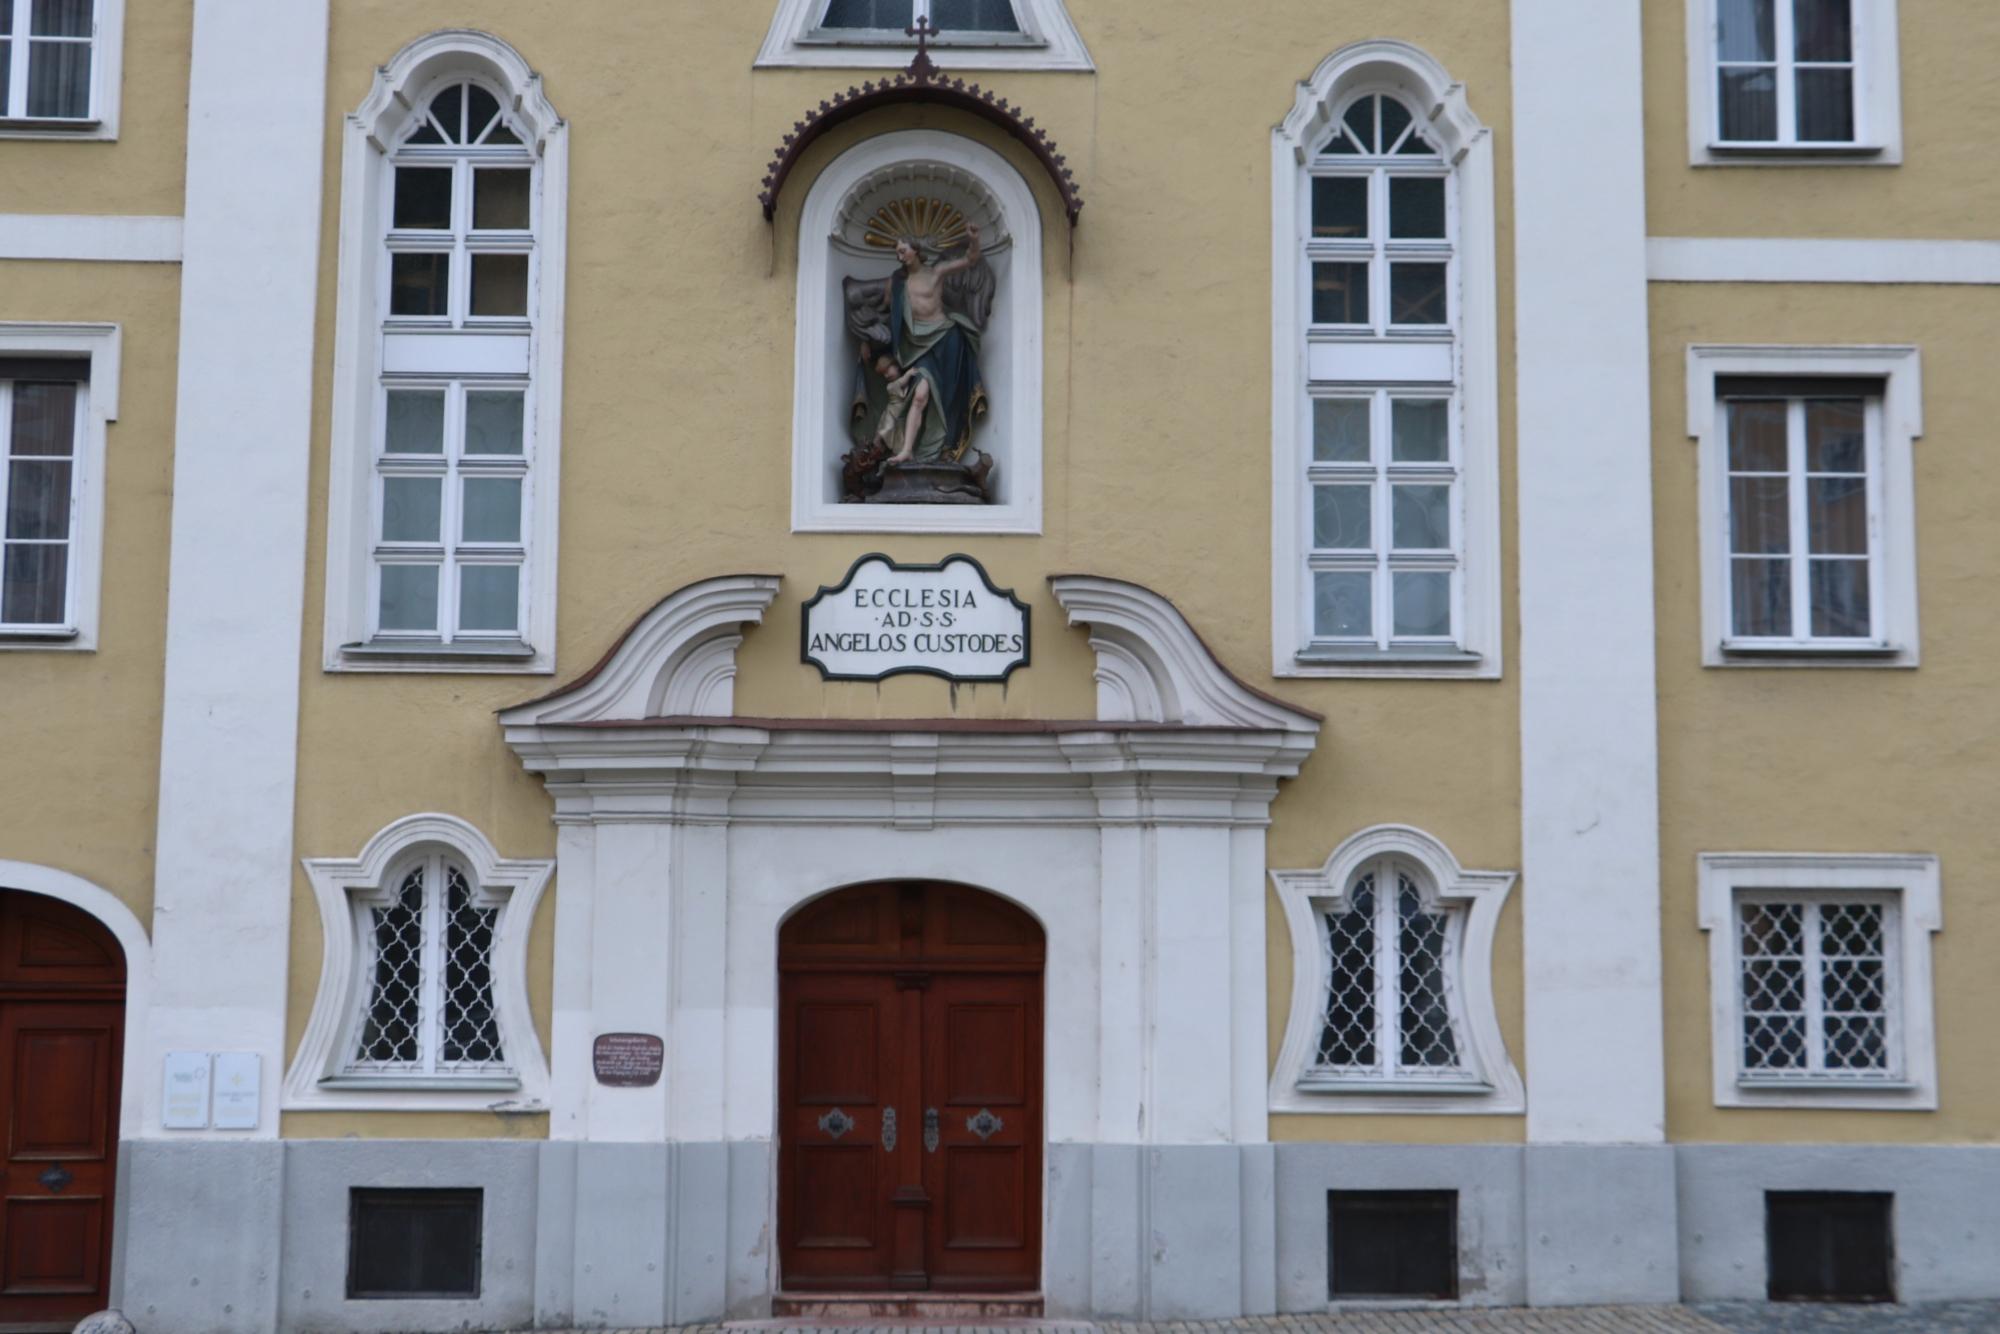 Stja_schutzengelkirche2